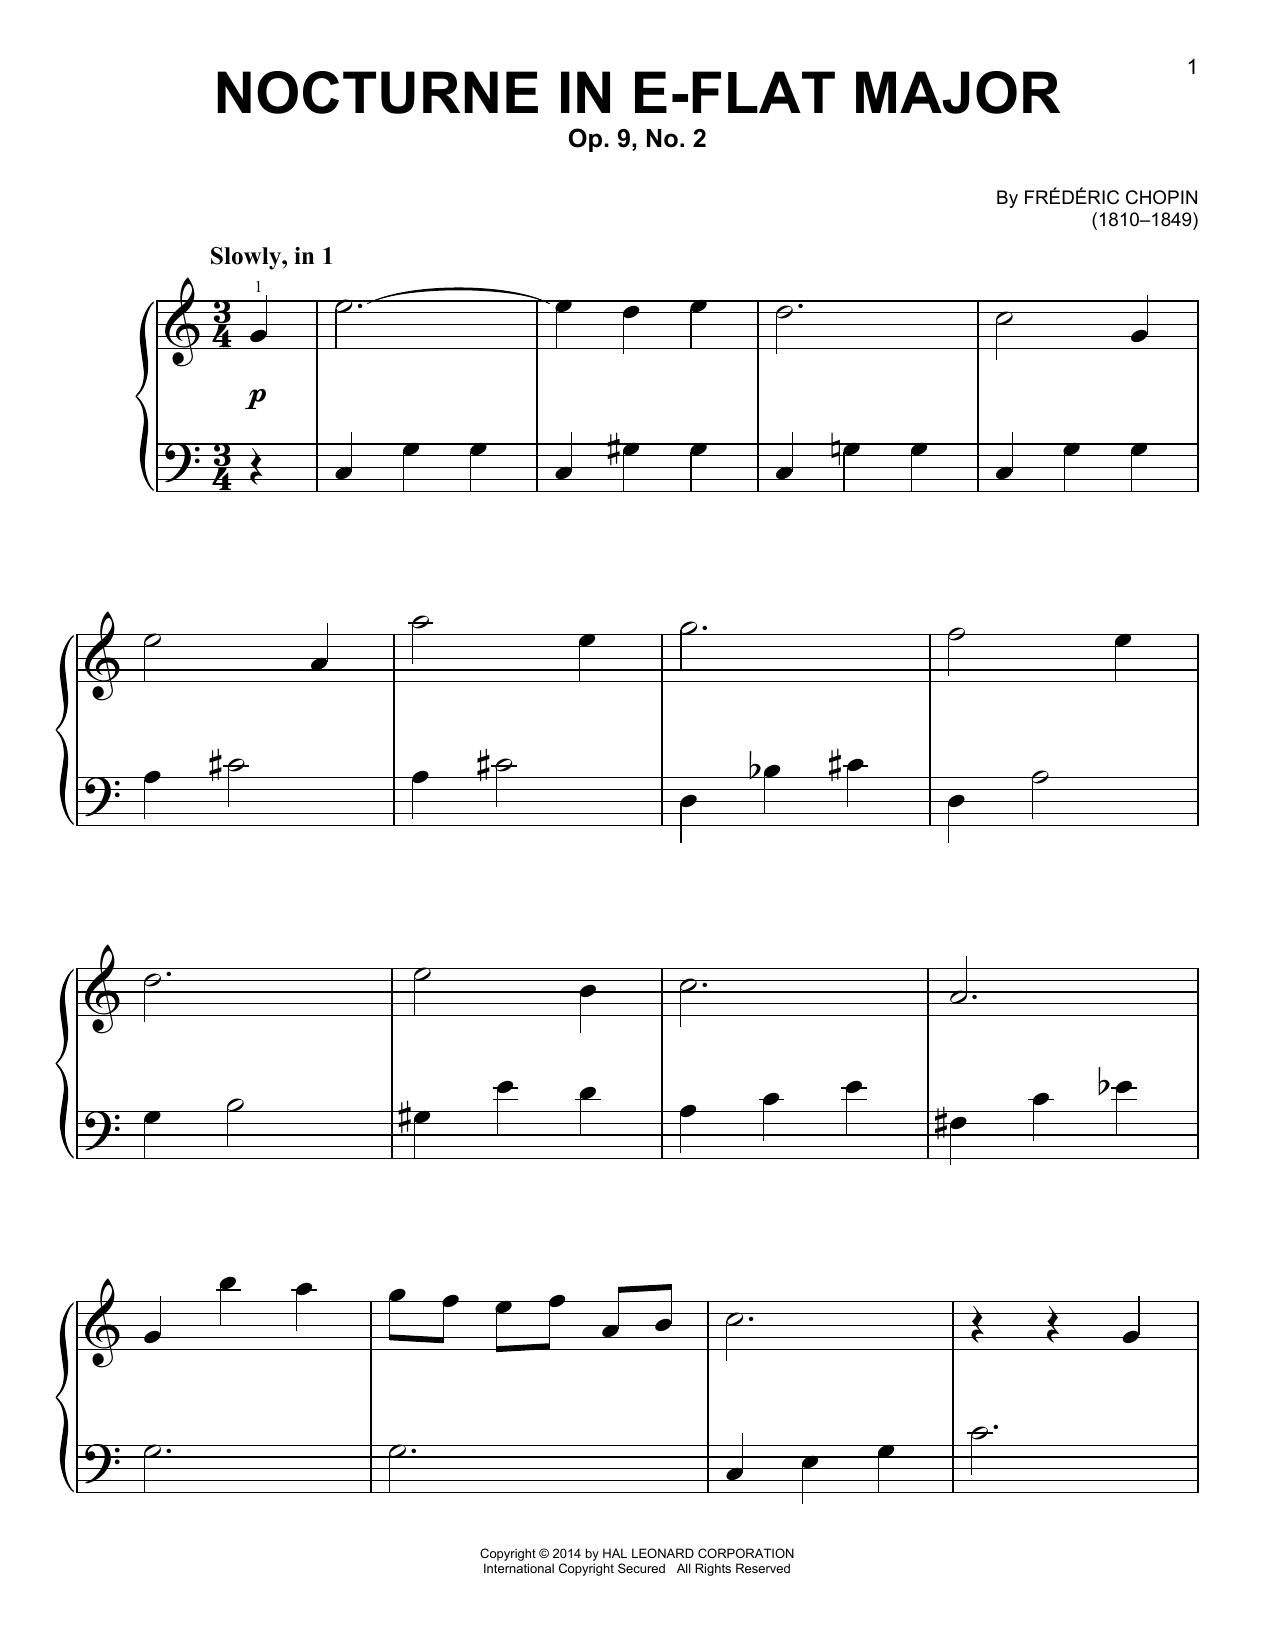 Nocturne In E Flat Major Op.9 No.2 Sheet Music